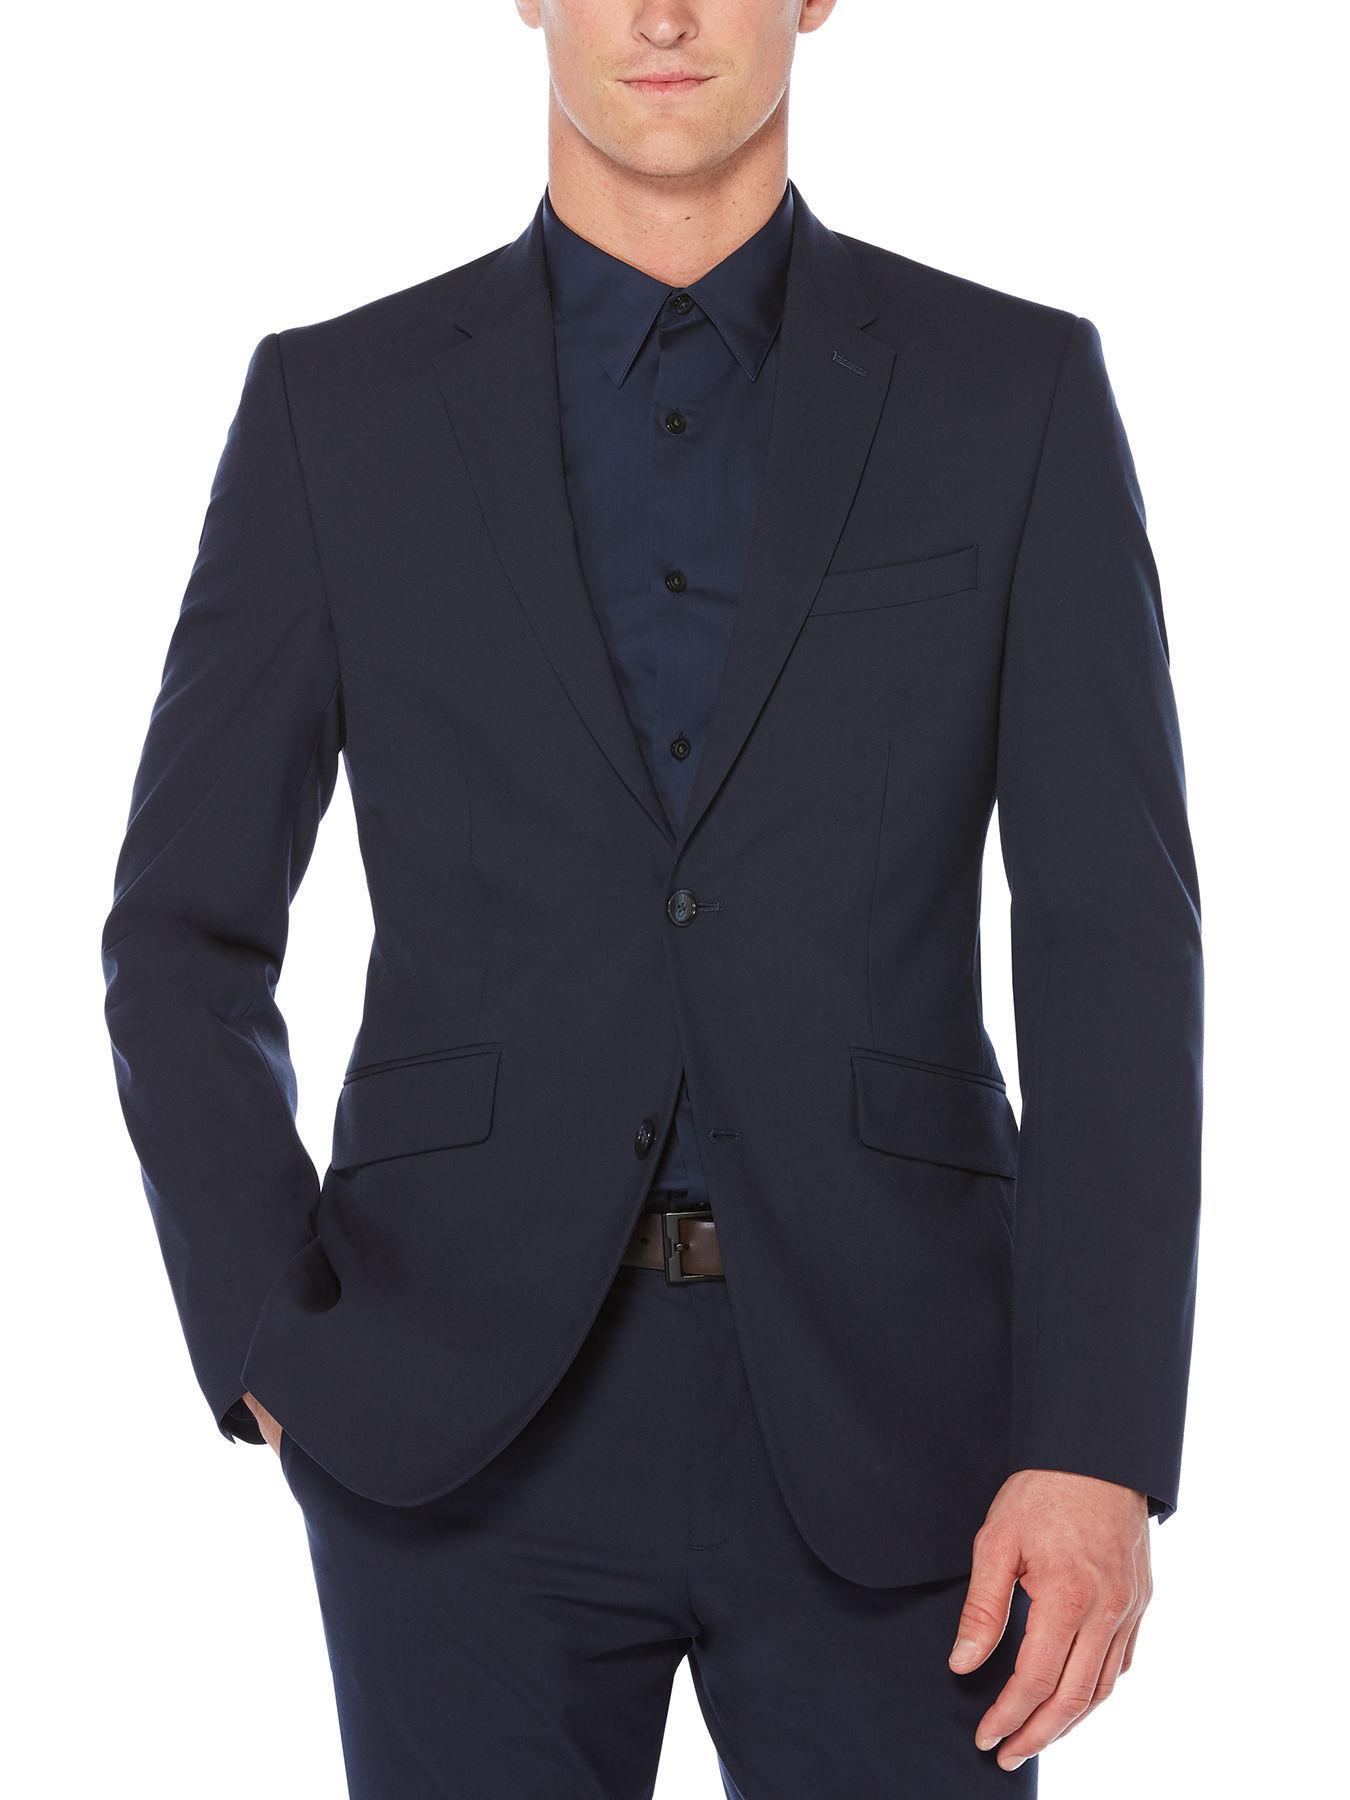 2387df3782 Lyst - Perry Ellis Slim Fit Tech Washable Suit Jacket in Blue for Men